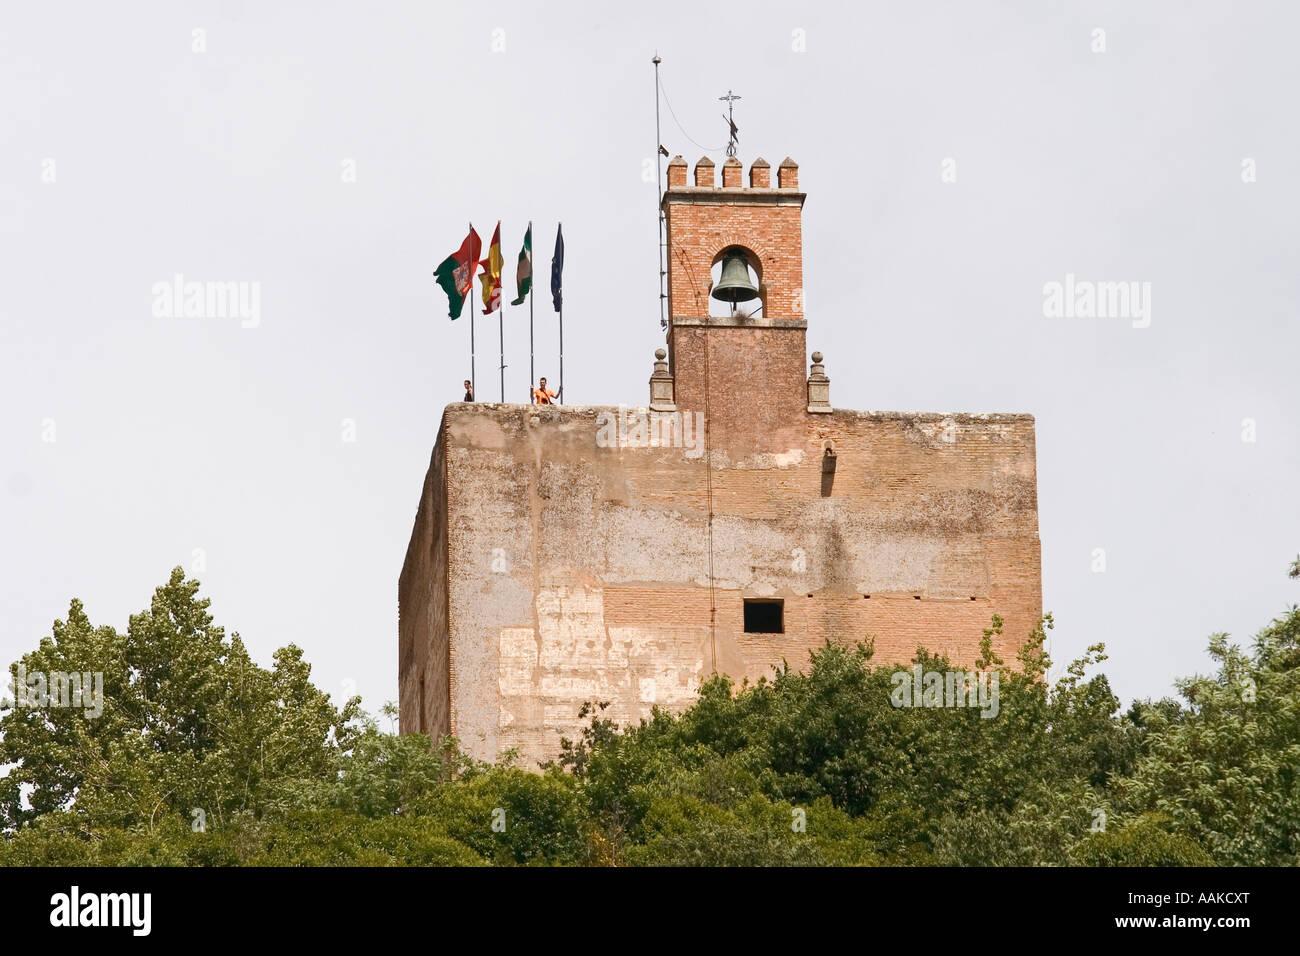 Torre de la Vela Alcazaba La Alhambra Granada Spain Stock Photo